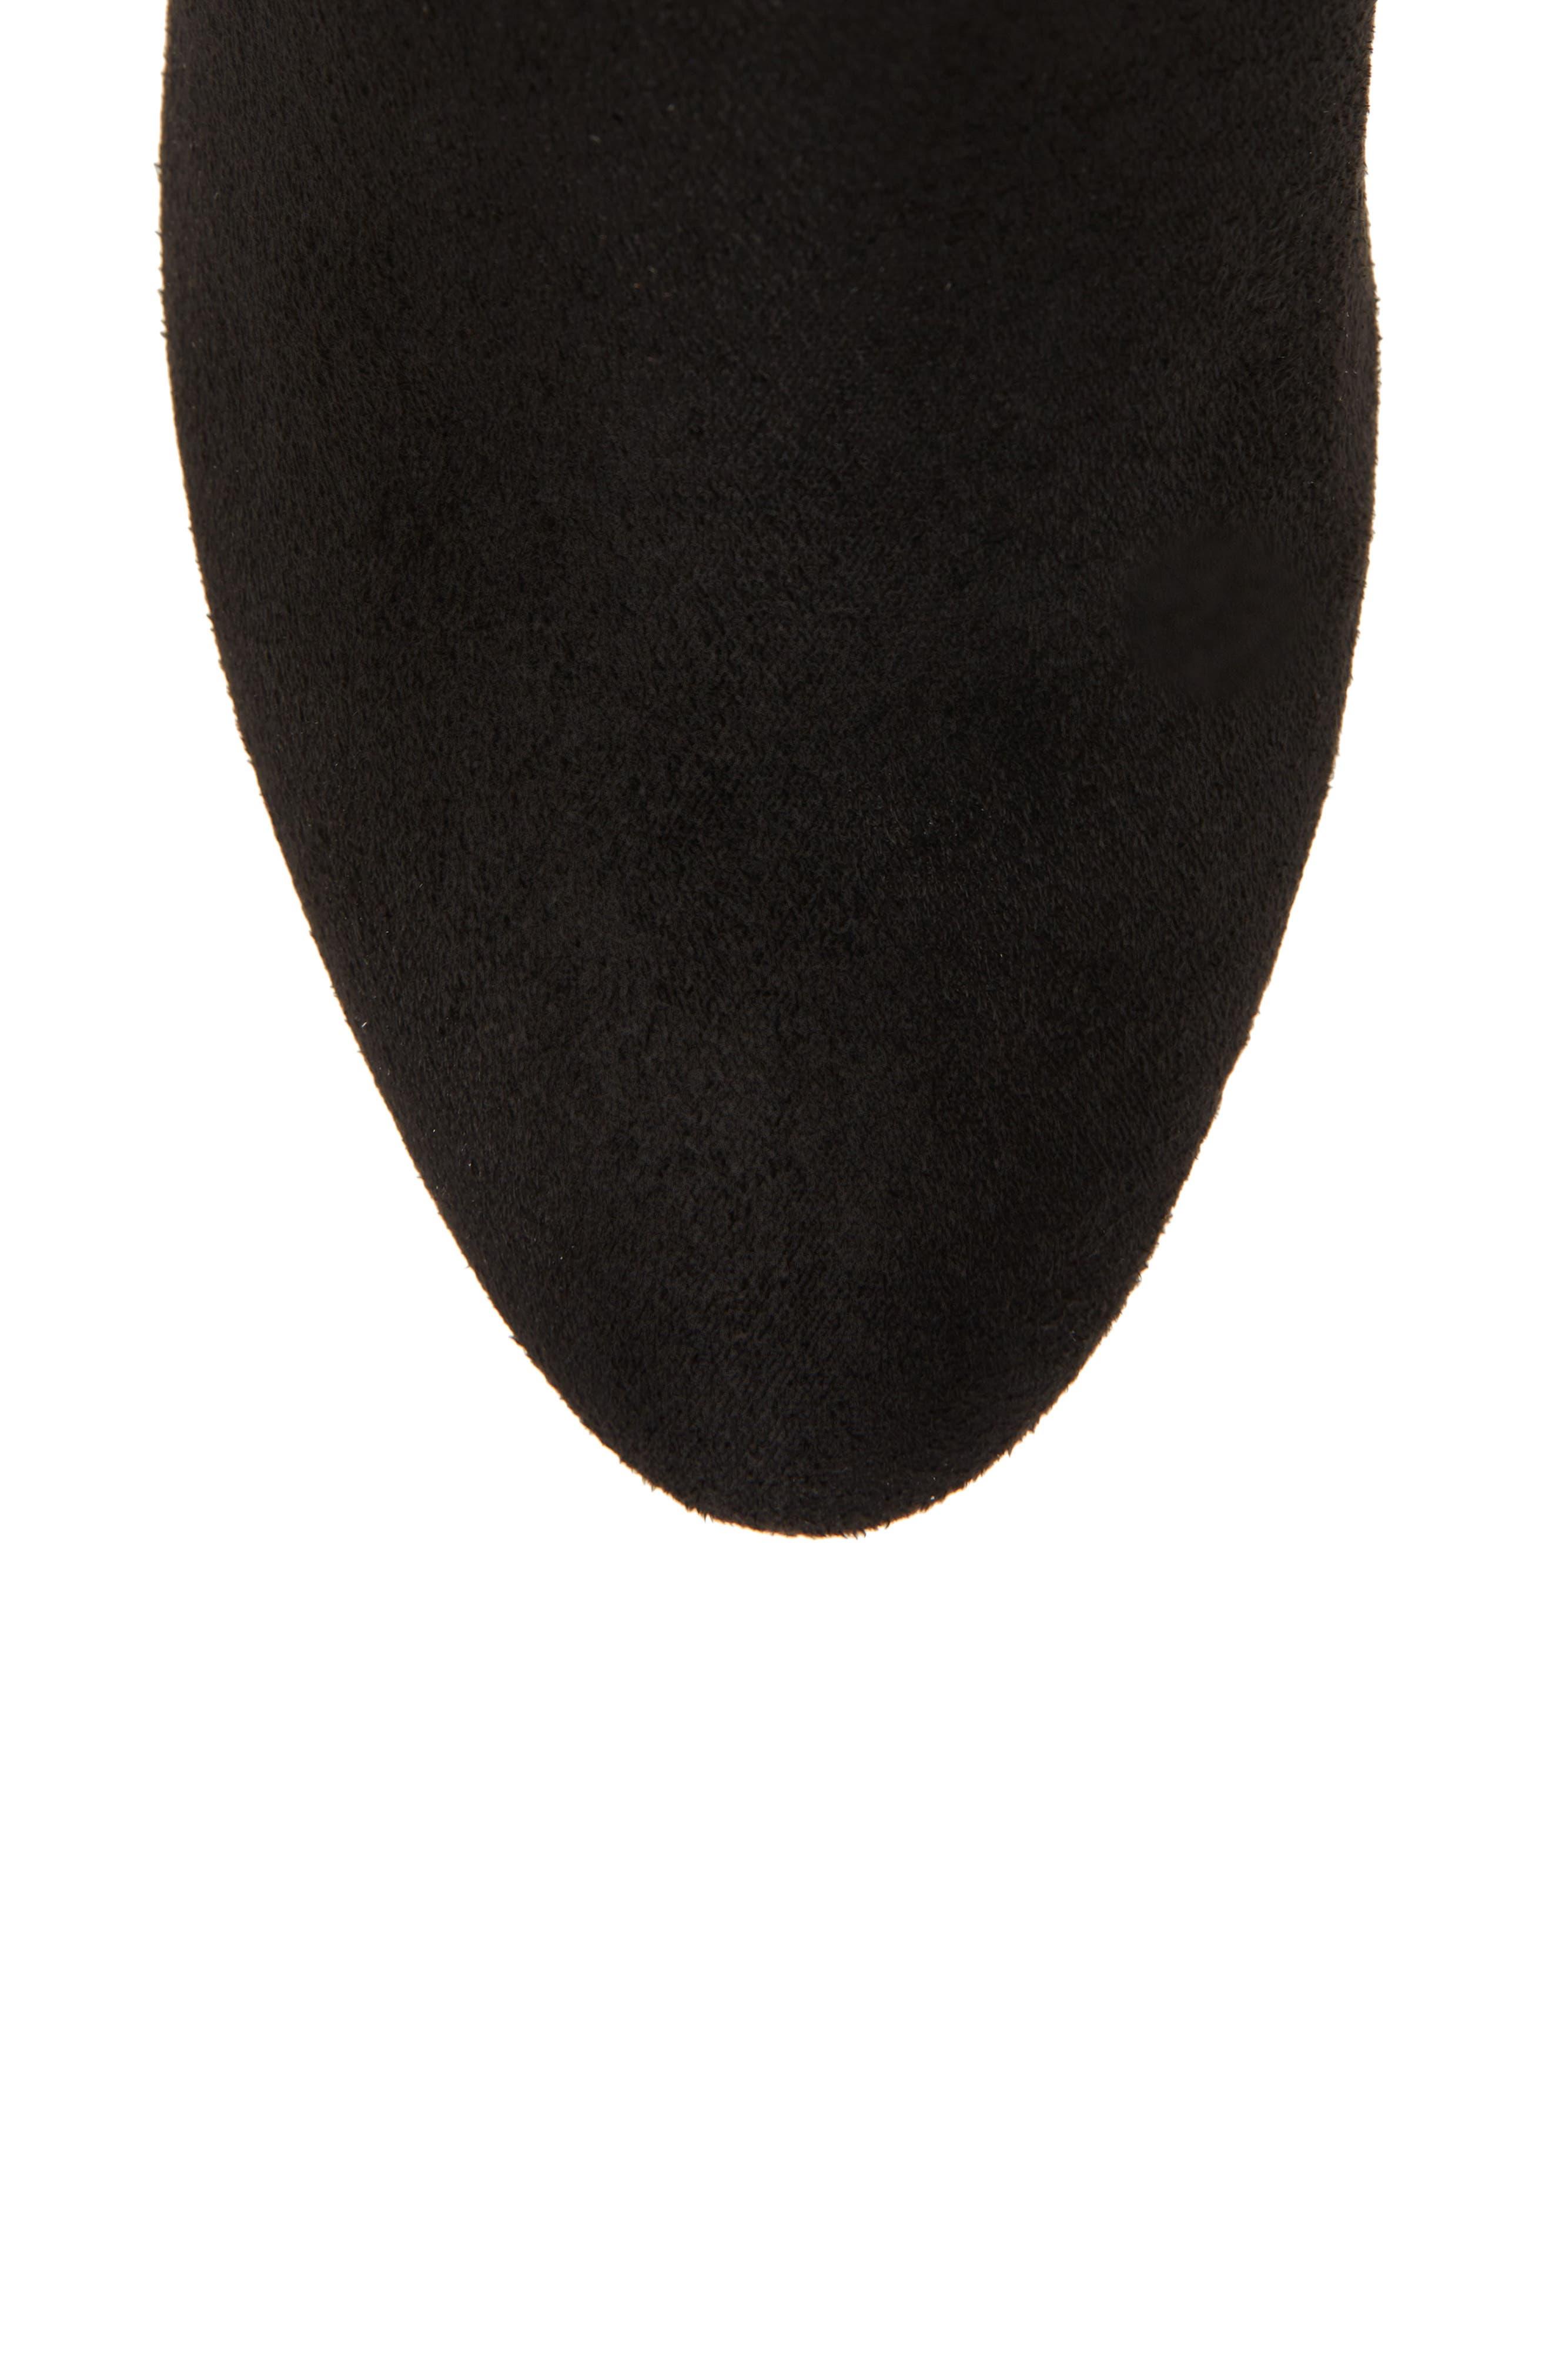 Gillian Knee High Boot,                             Alternate thumbnail 5, color,                             BLACK SUEDE